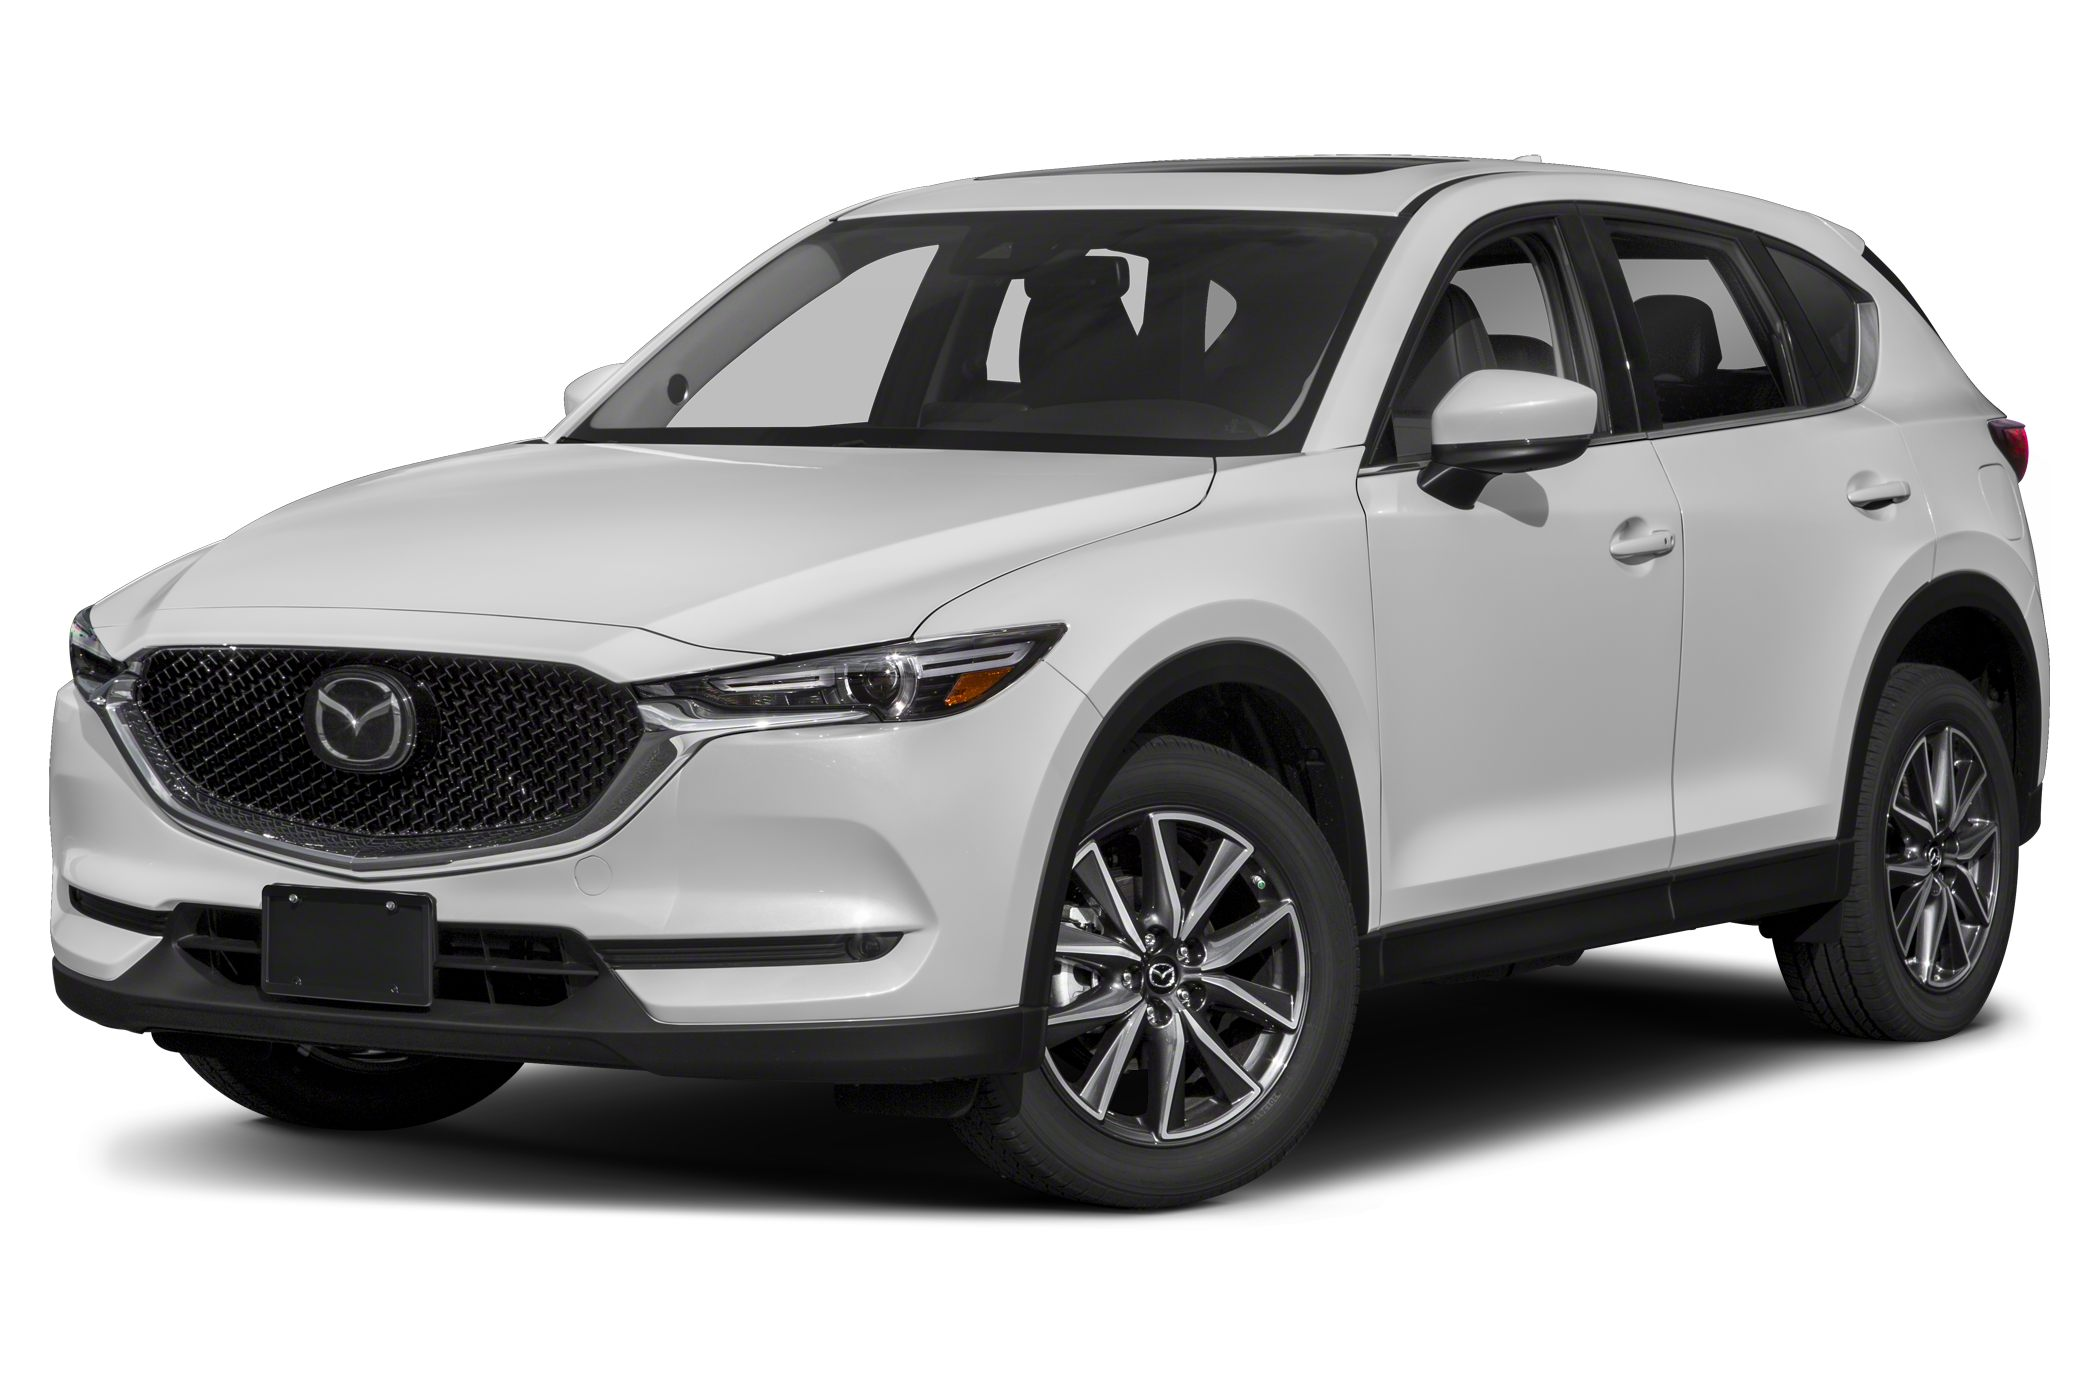 2018 Mazda CX 5 Information